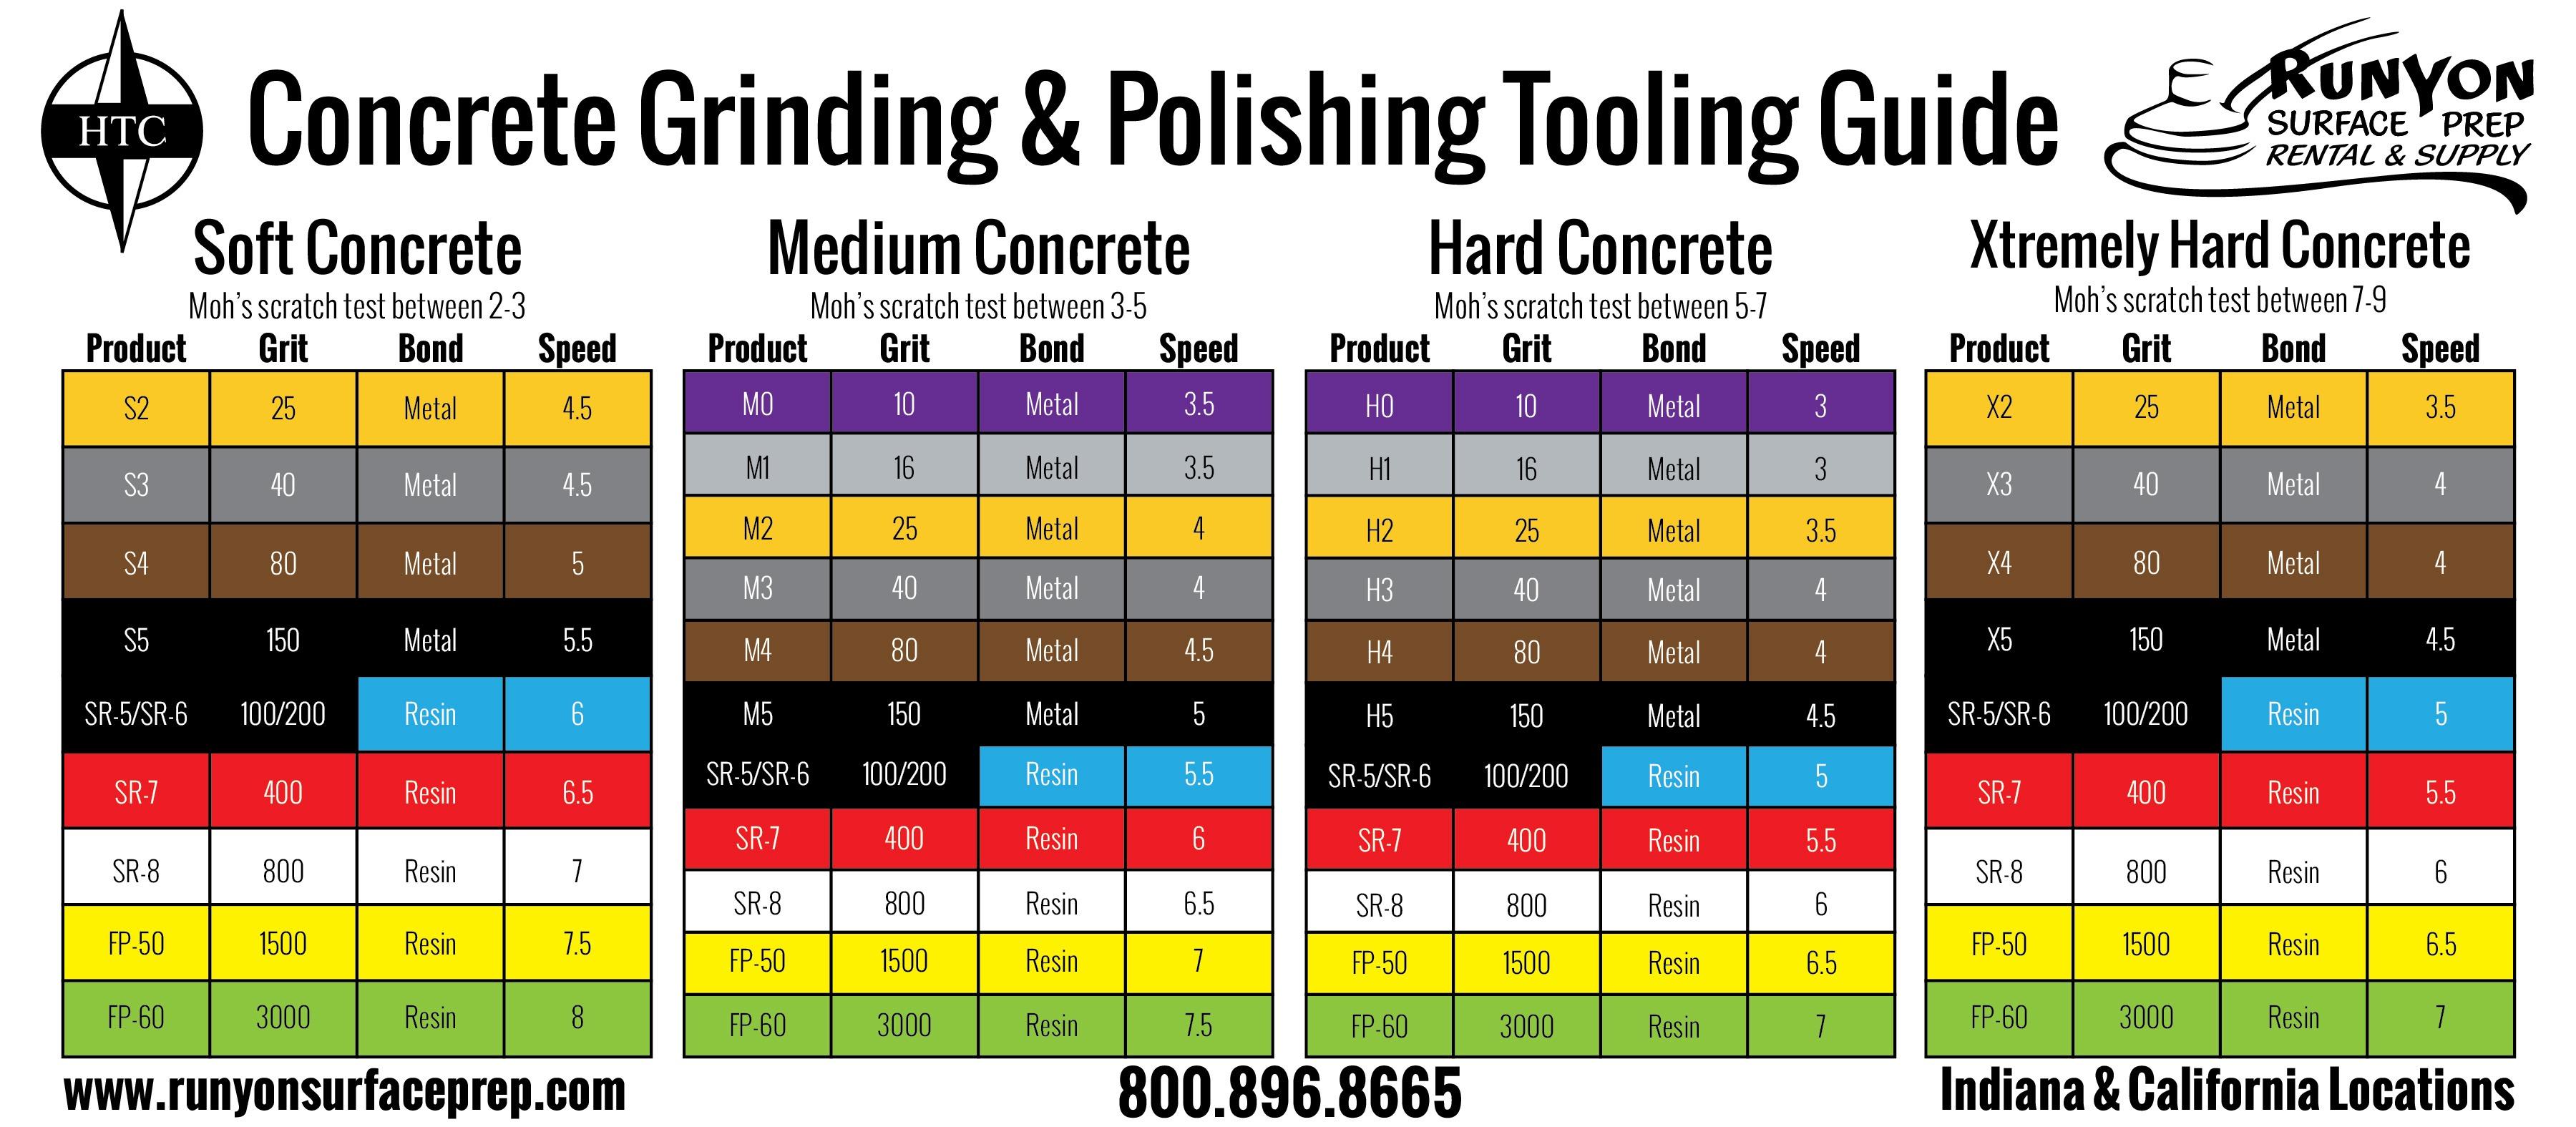 HTC Grinding & Polishing Tooling Guide